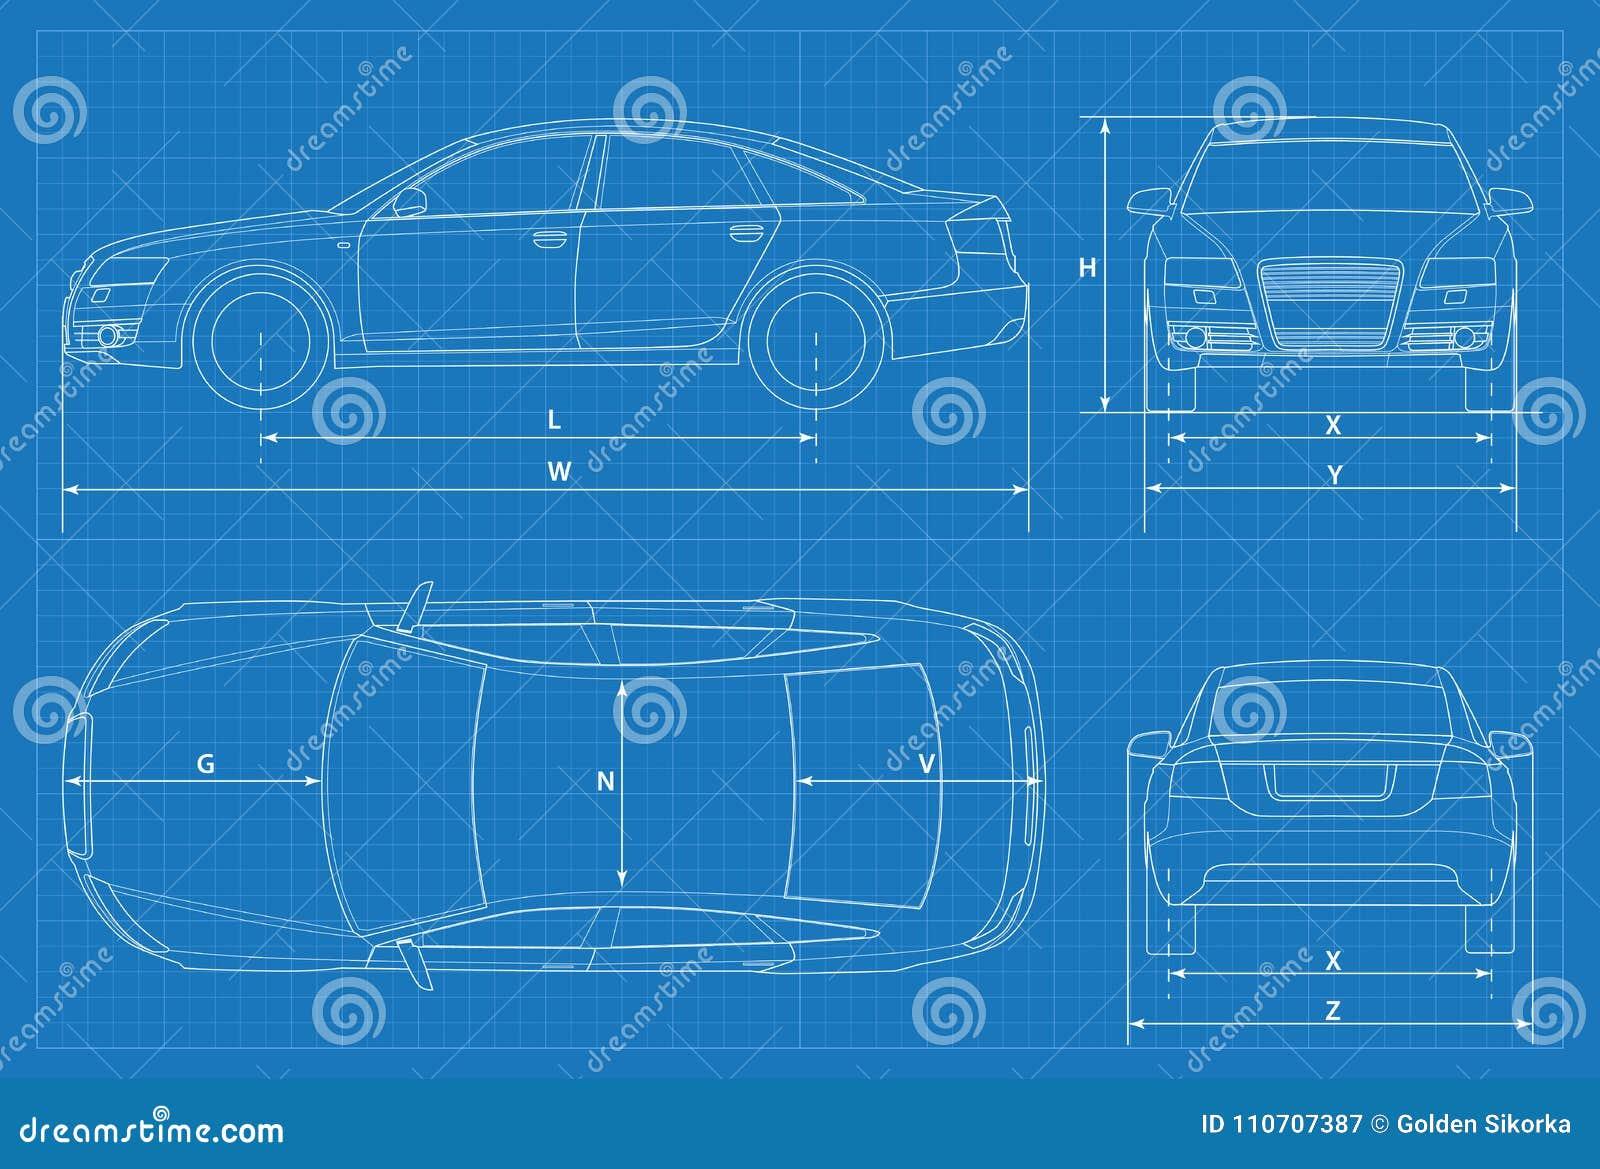 Fantastisch Fahrzeug Diagramm Ideen - Schaltplan Serie Circuit ...